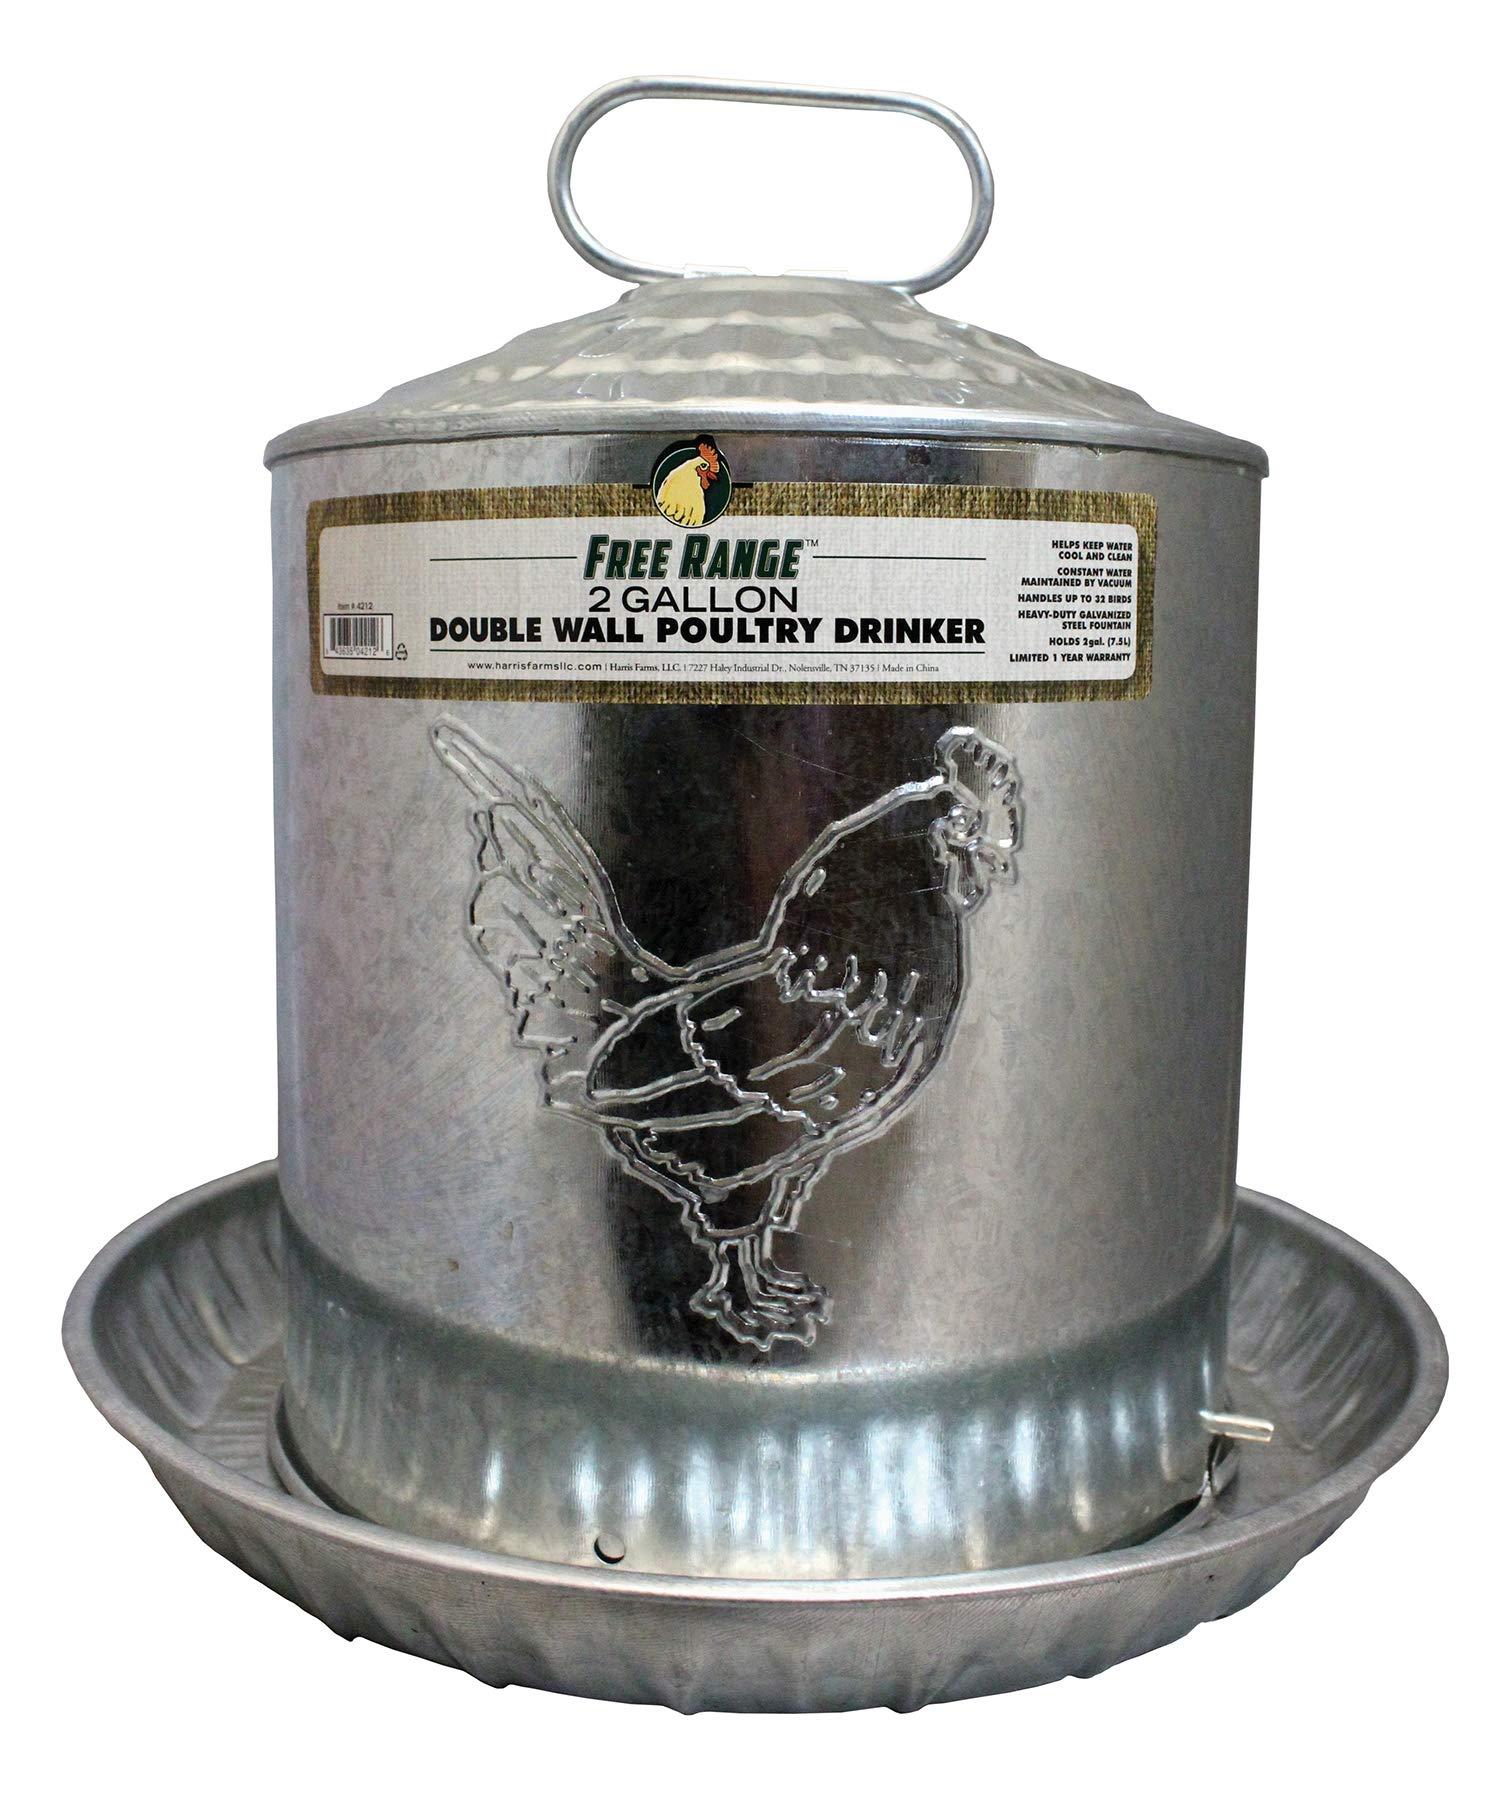 HARRIS FARMS 1000263 Free Range Galvanized Double Wall Poultry Drinker, 2 Gallon, Silver by Harris Farms